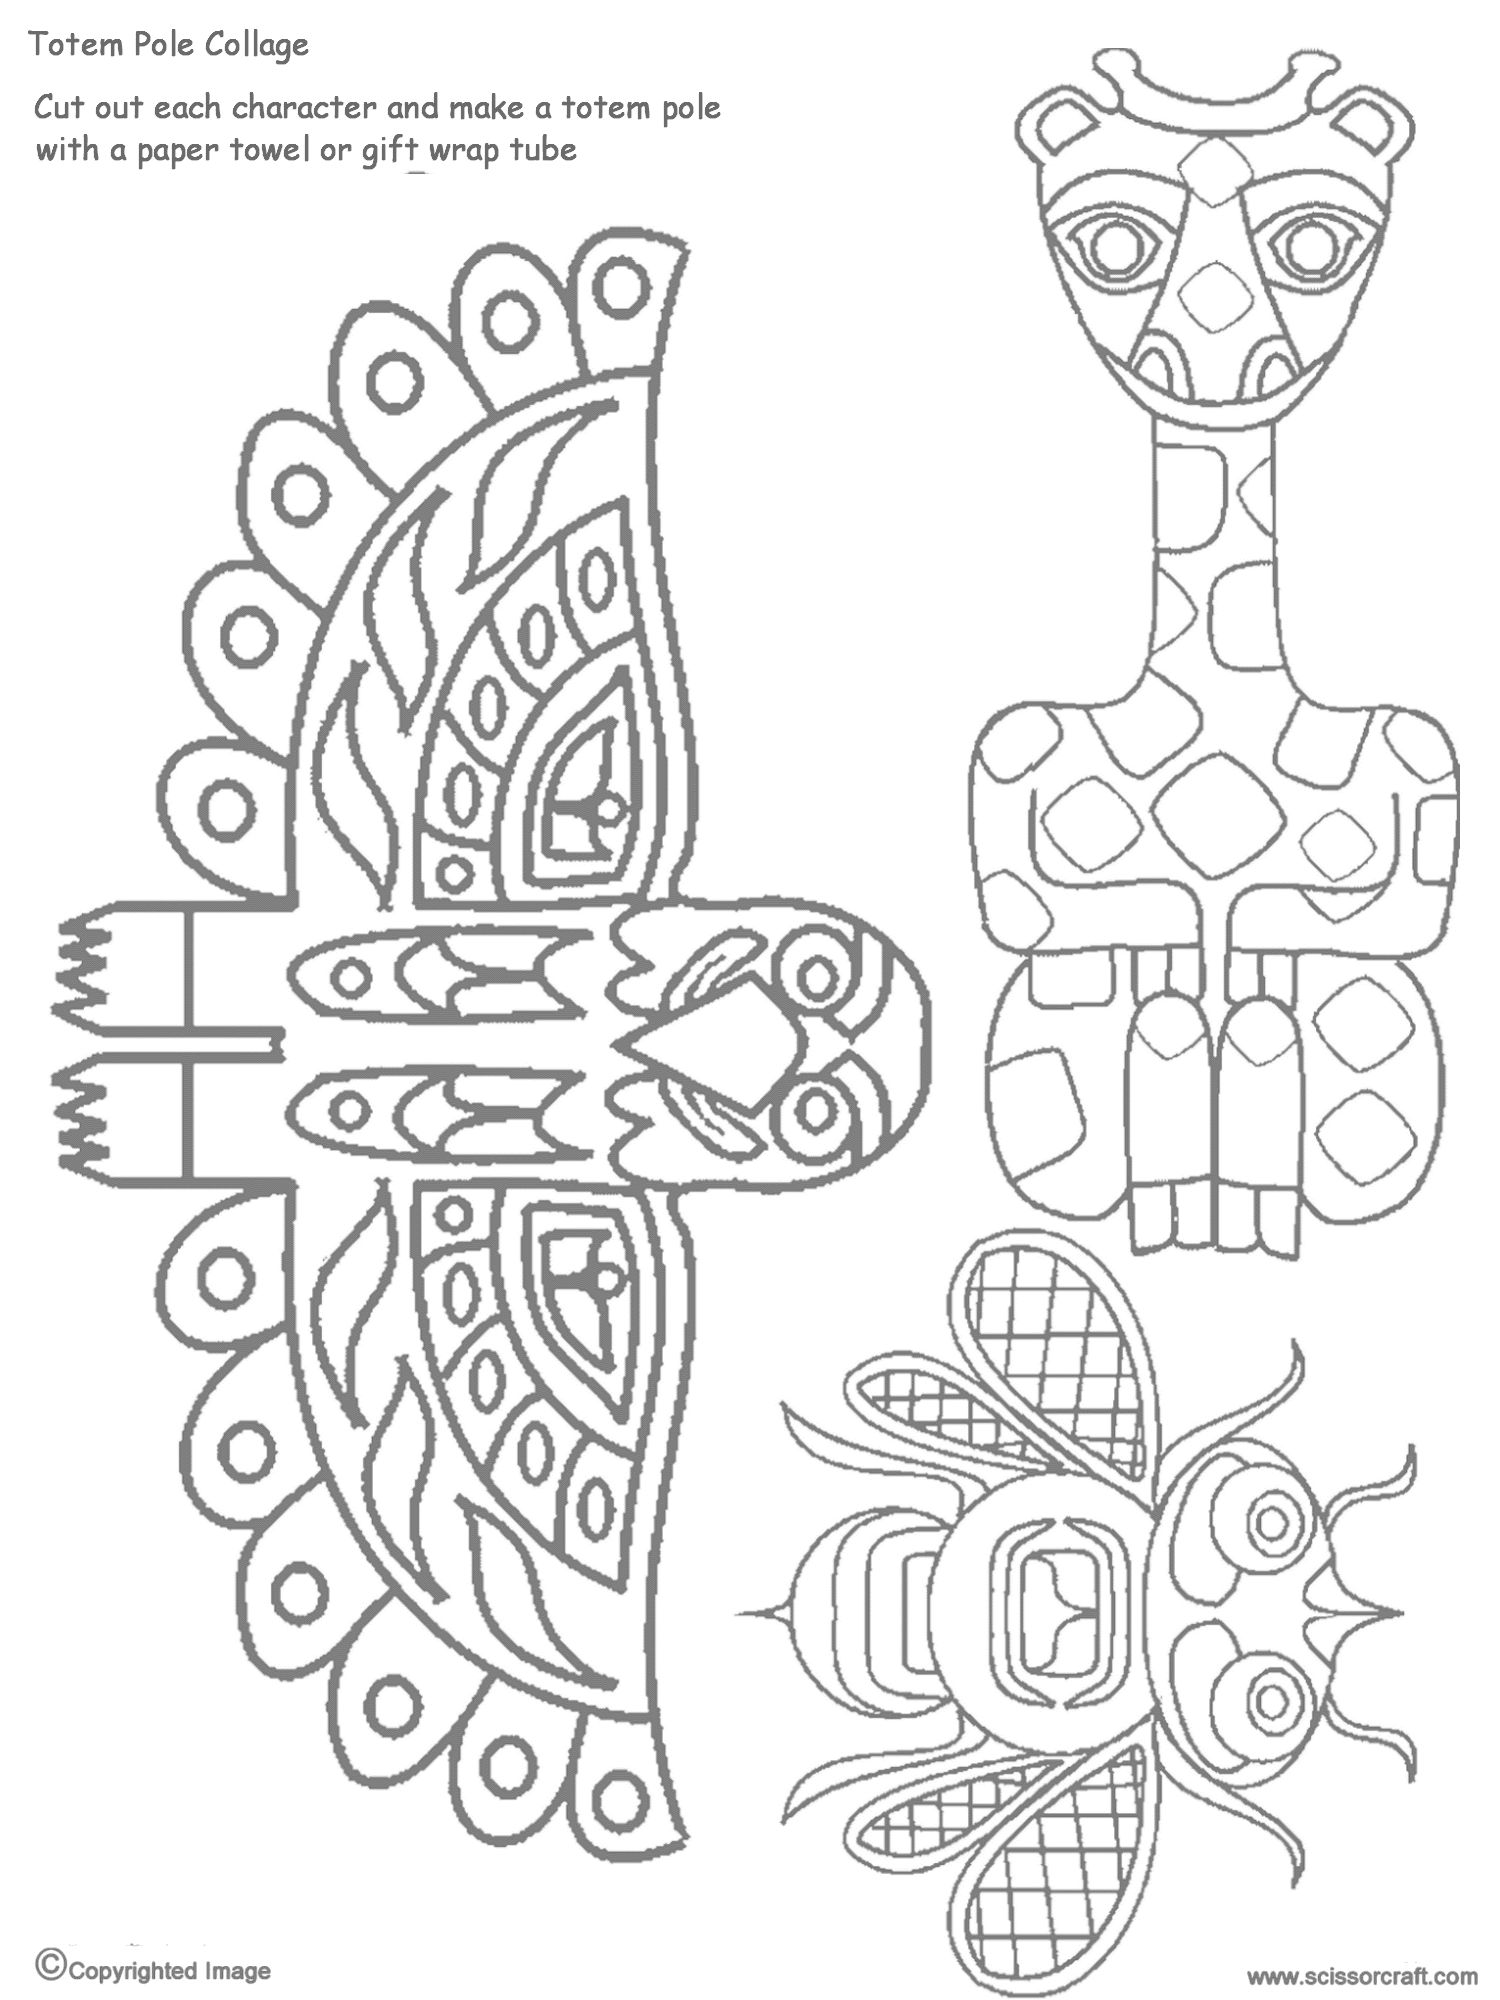 Totem Pole Collage Pieces